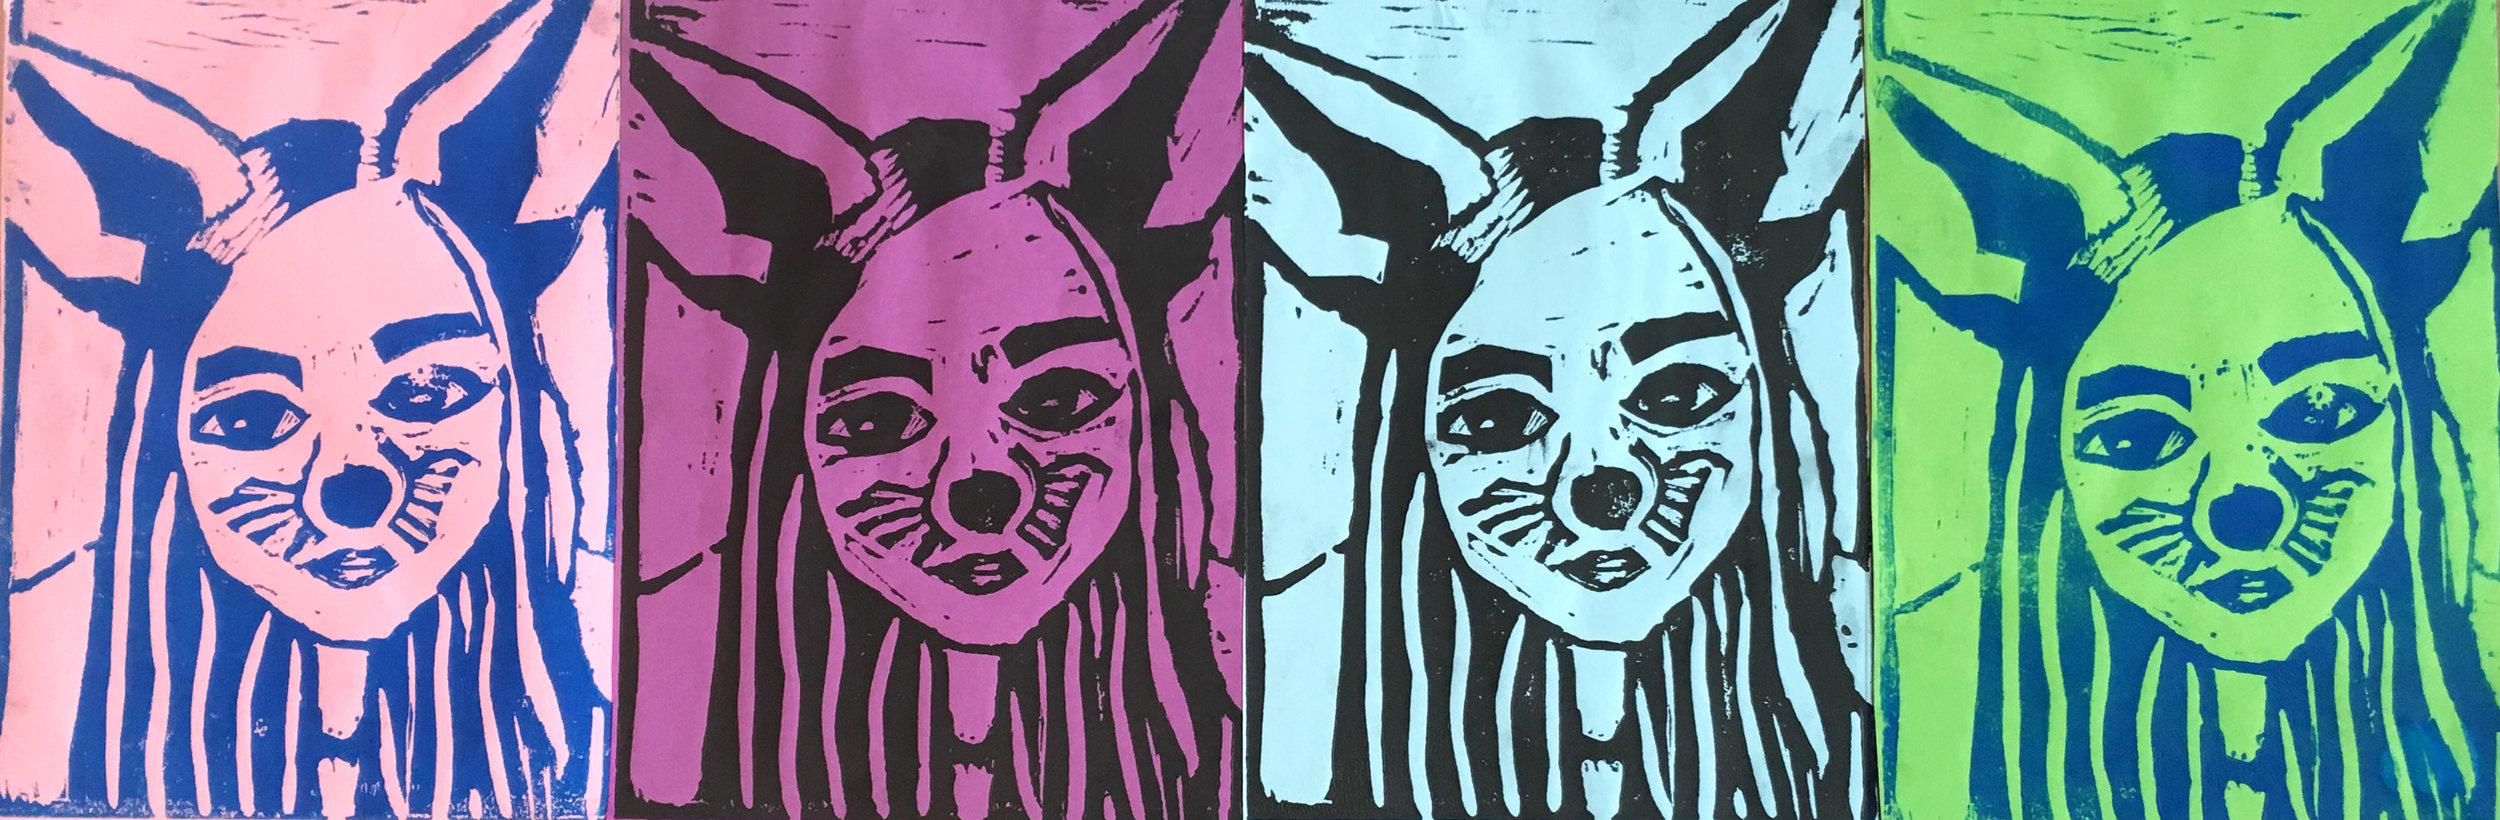 printmaking22.jpg